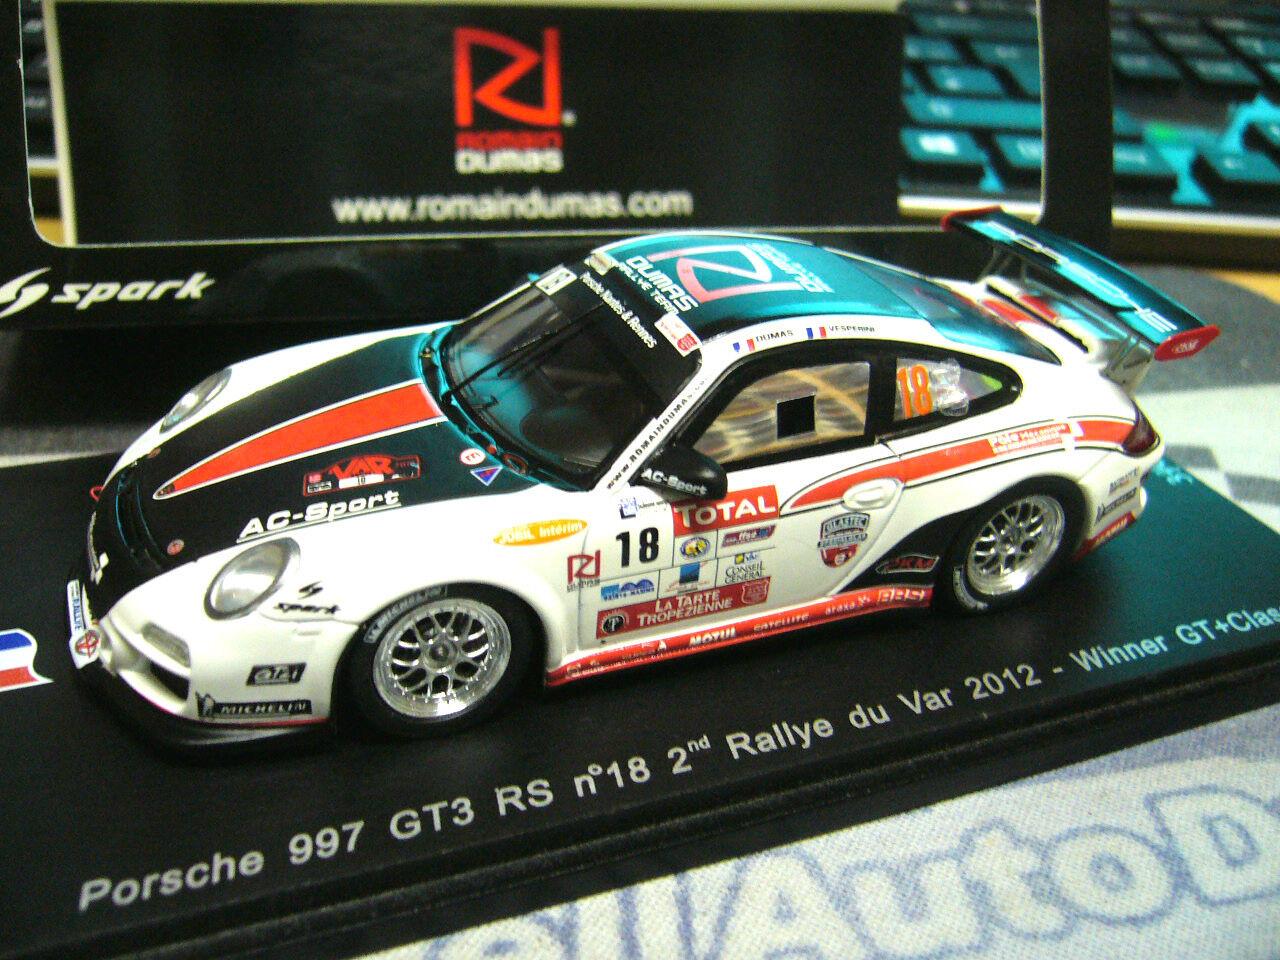 Porsche 911 997 gt3 rs  18 rallye tu var 2012 winner Dumas spark 1 750 Lim 1 43